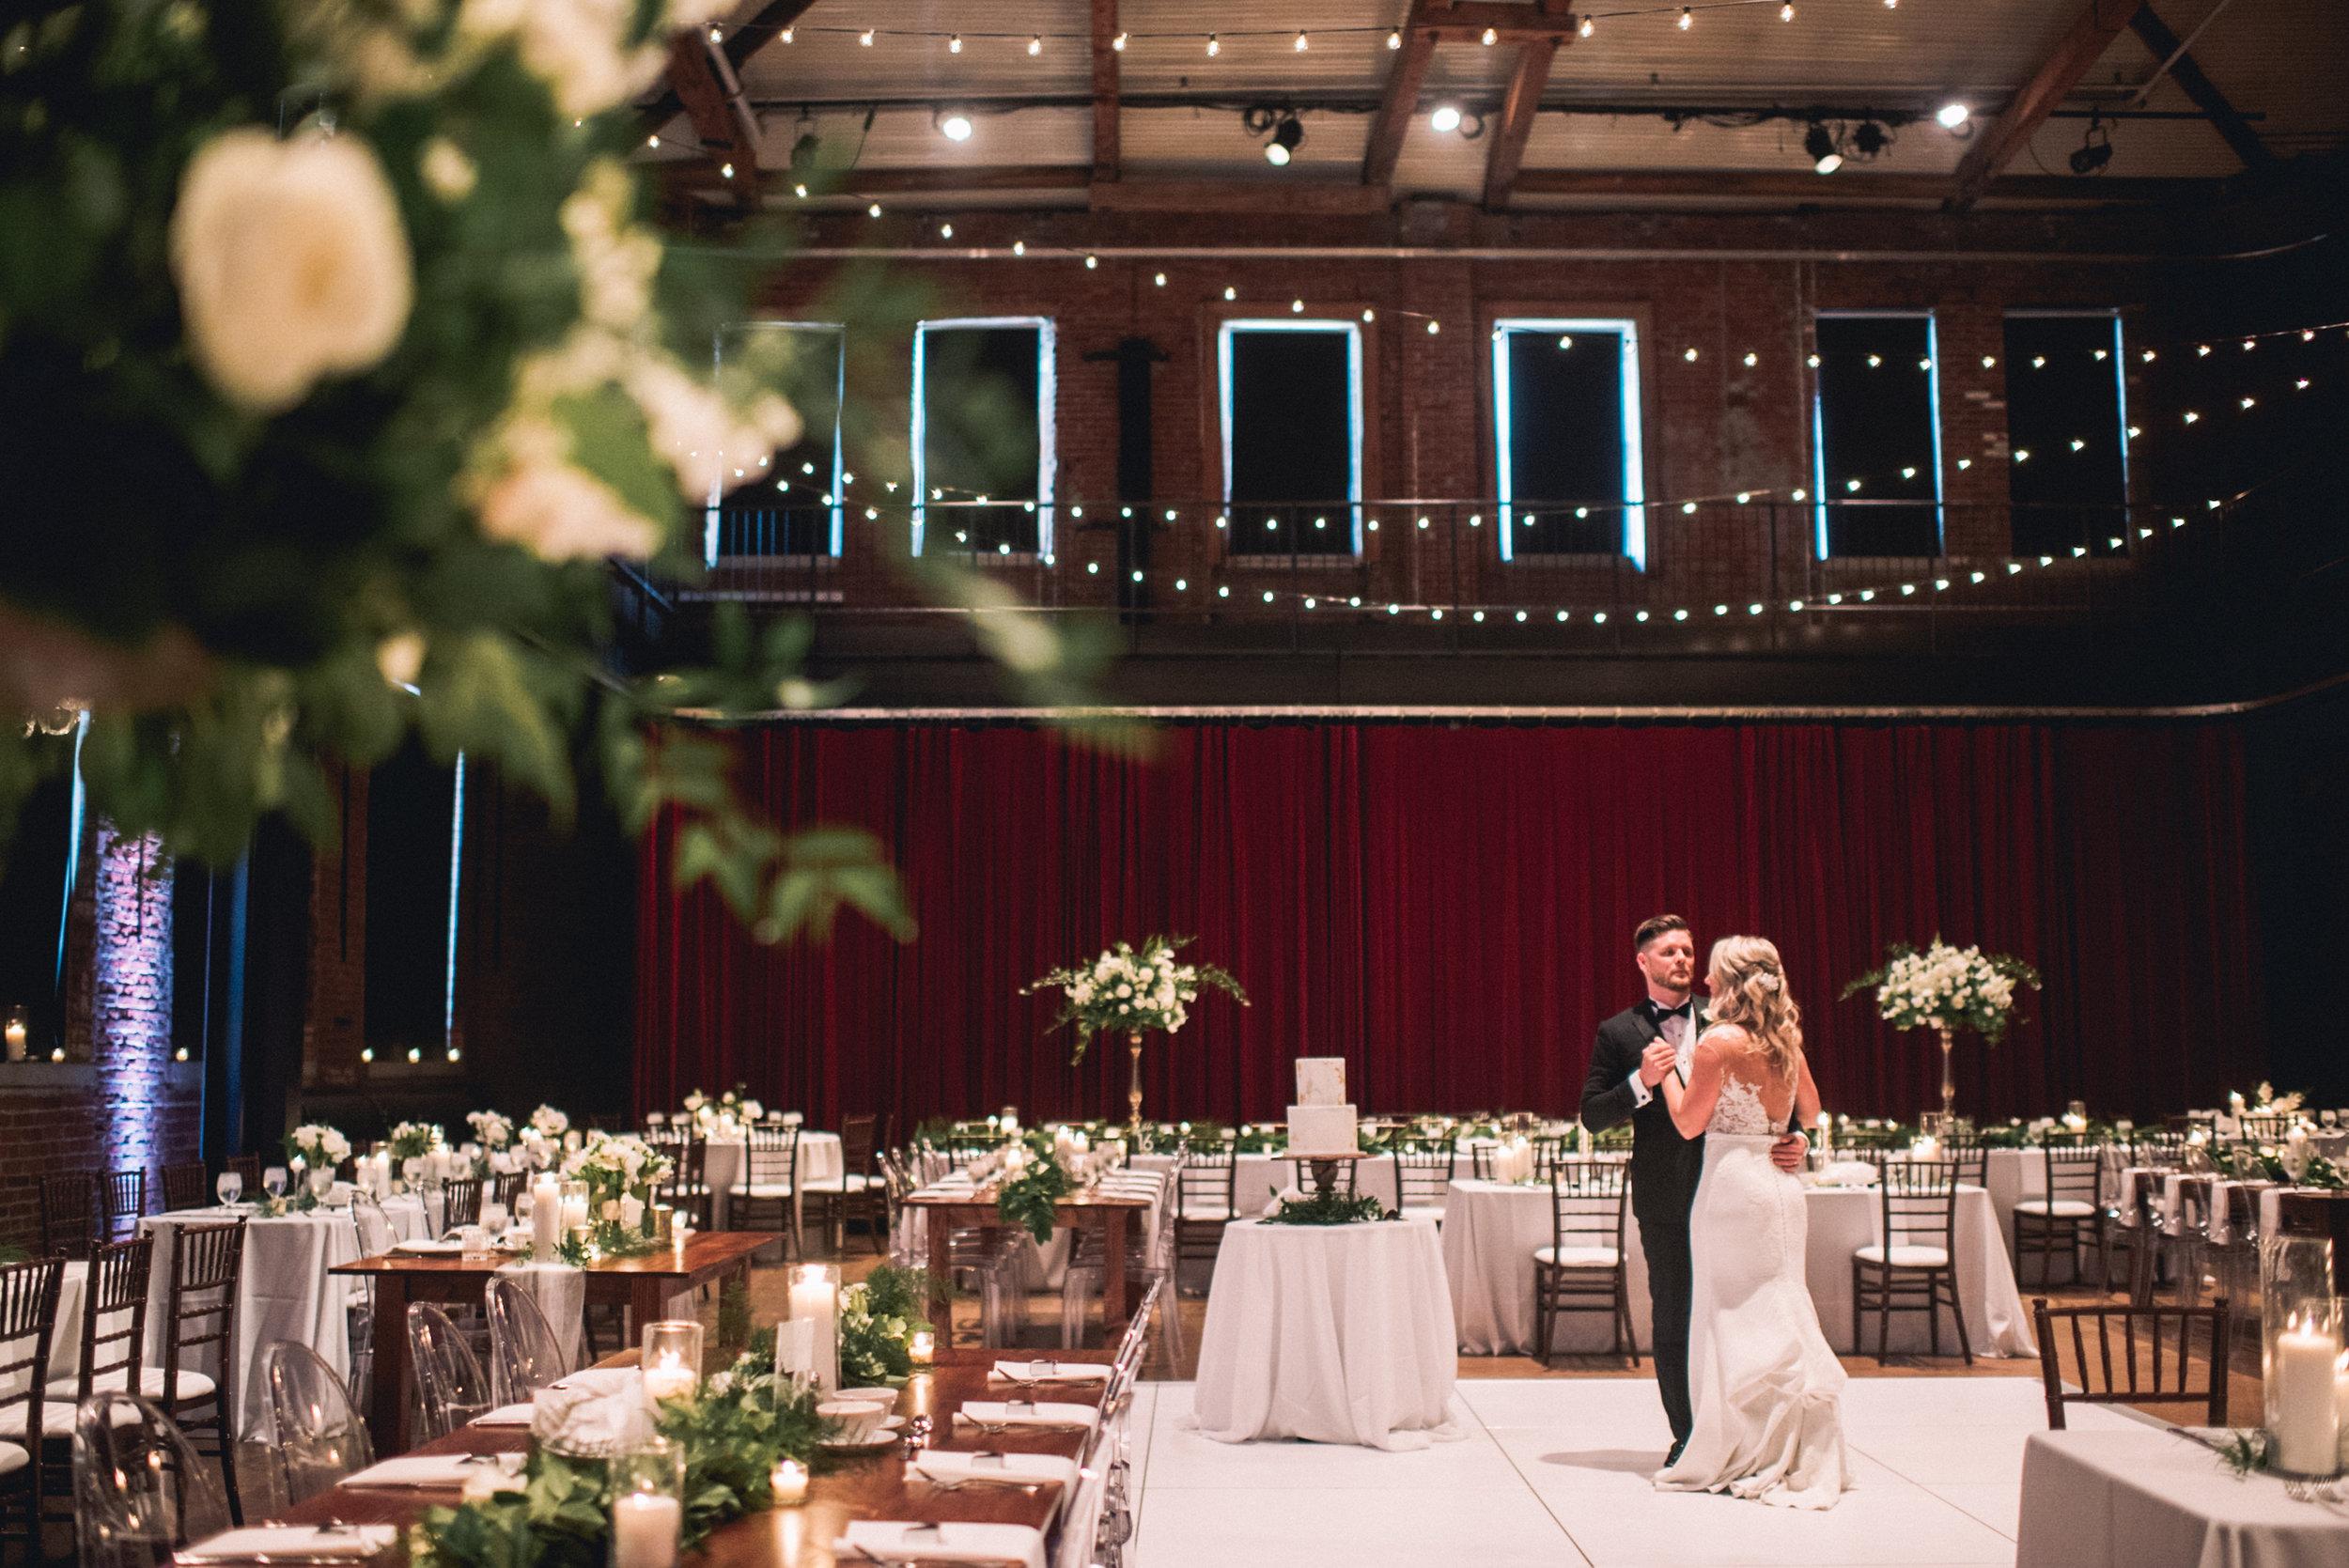 Pittsburgh Pennsylvania New York NYC Wedding Photographer Photojournalist Luxury Downtown Opera - Stirpe 1205.jpg